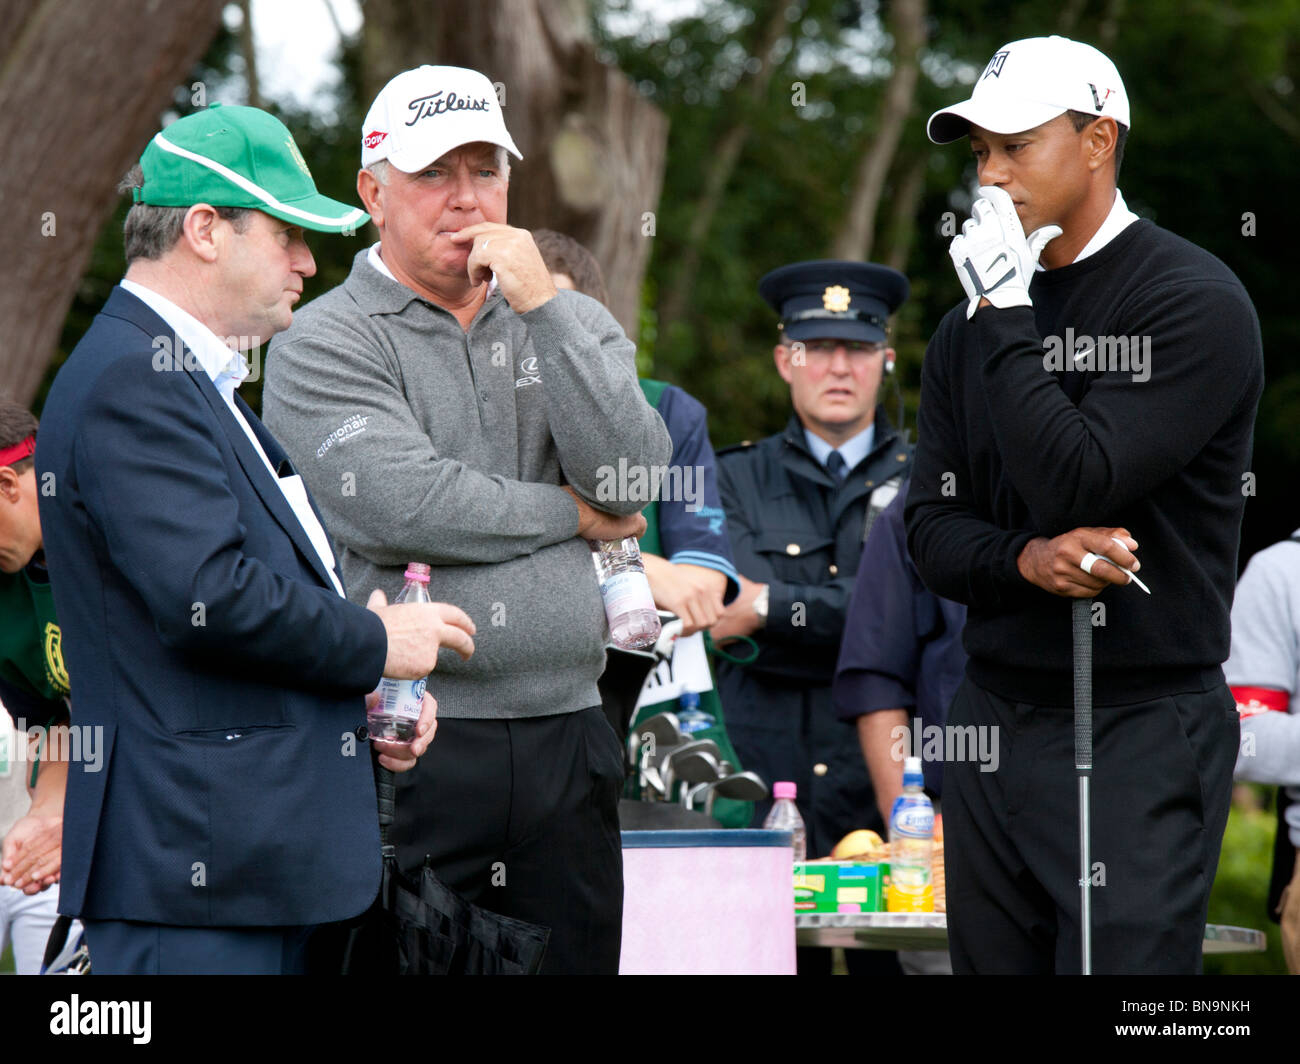 c5f11bd090710 JP McManus Mark O Meara Tiger Woods at Pro-Am Golf Tournament